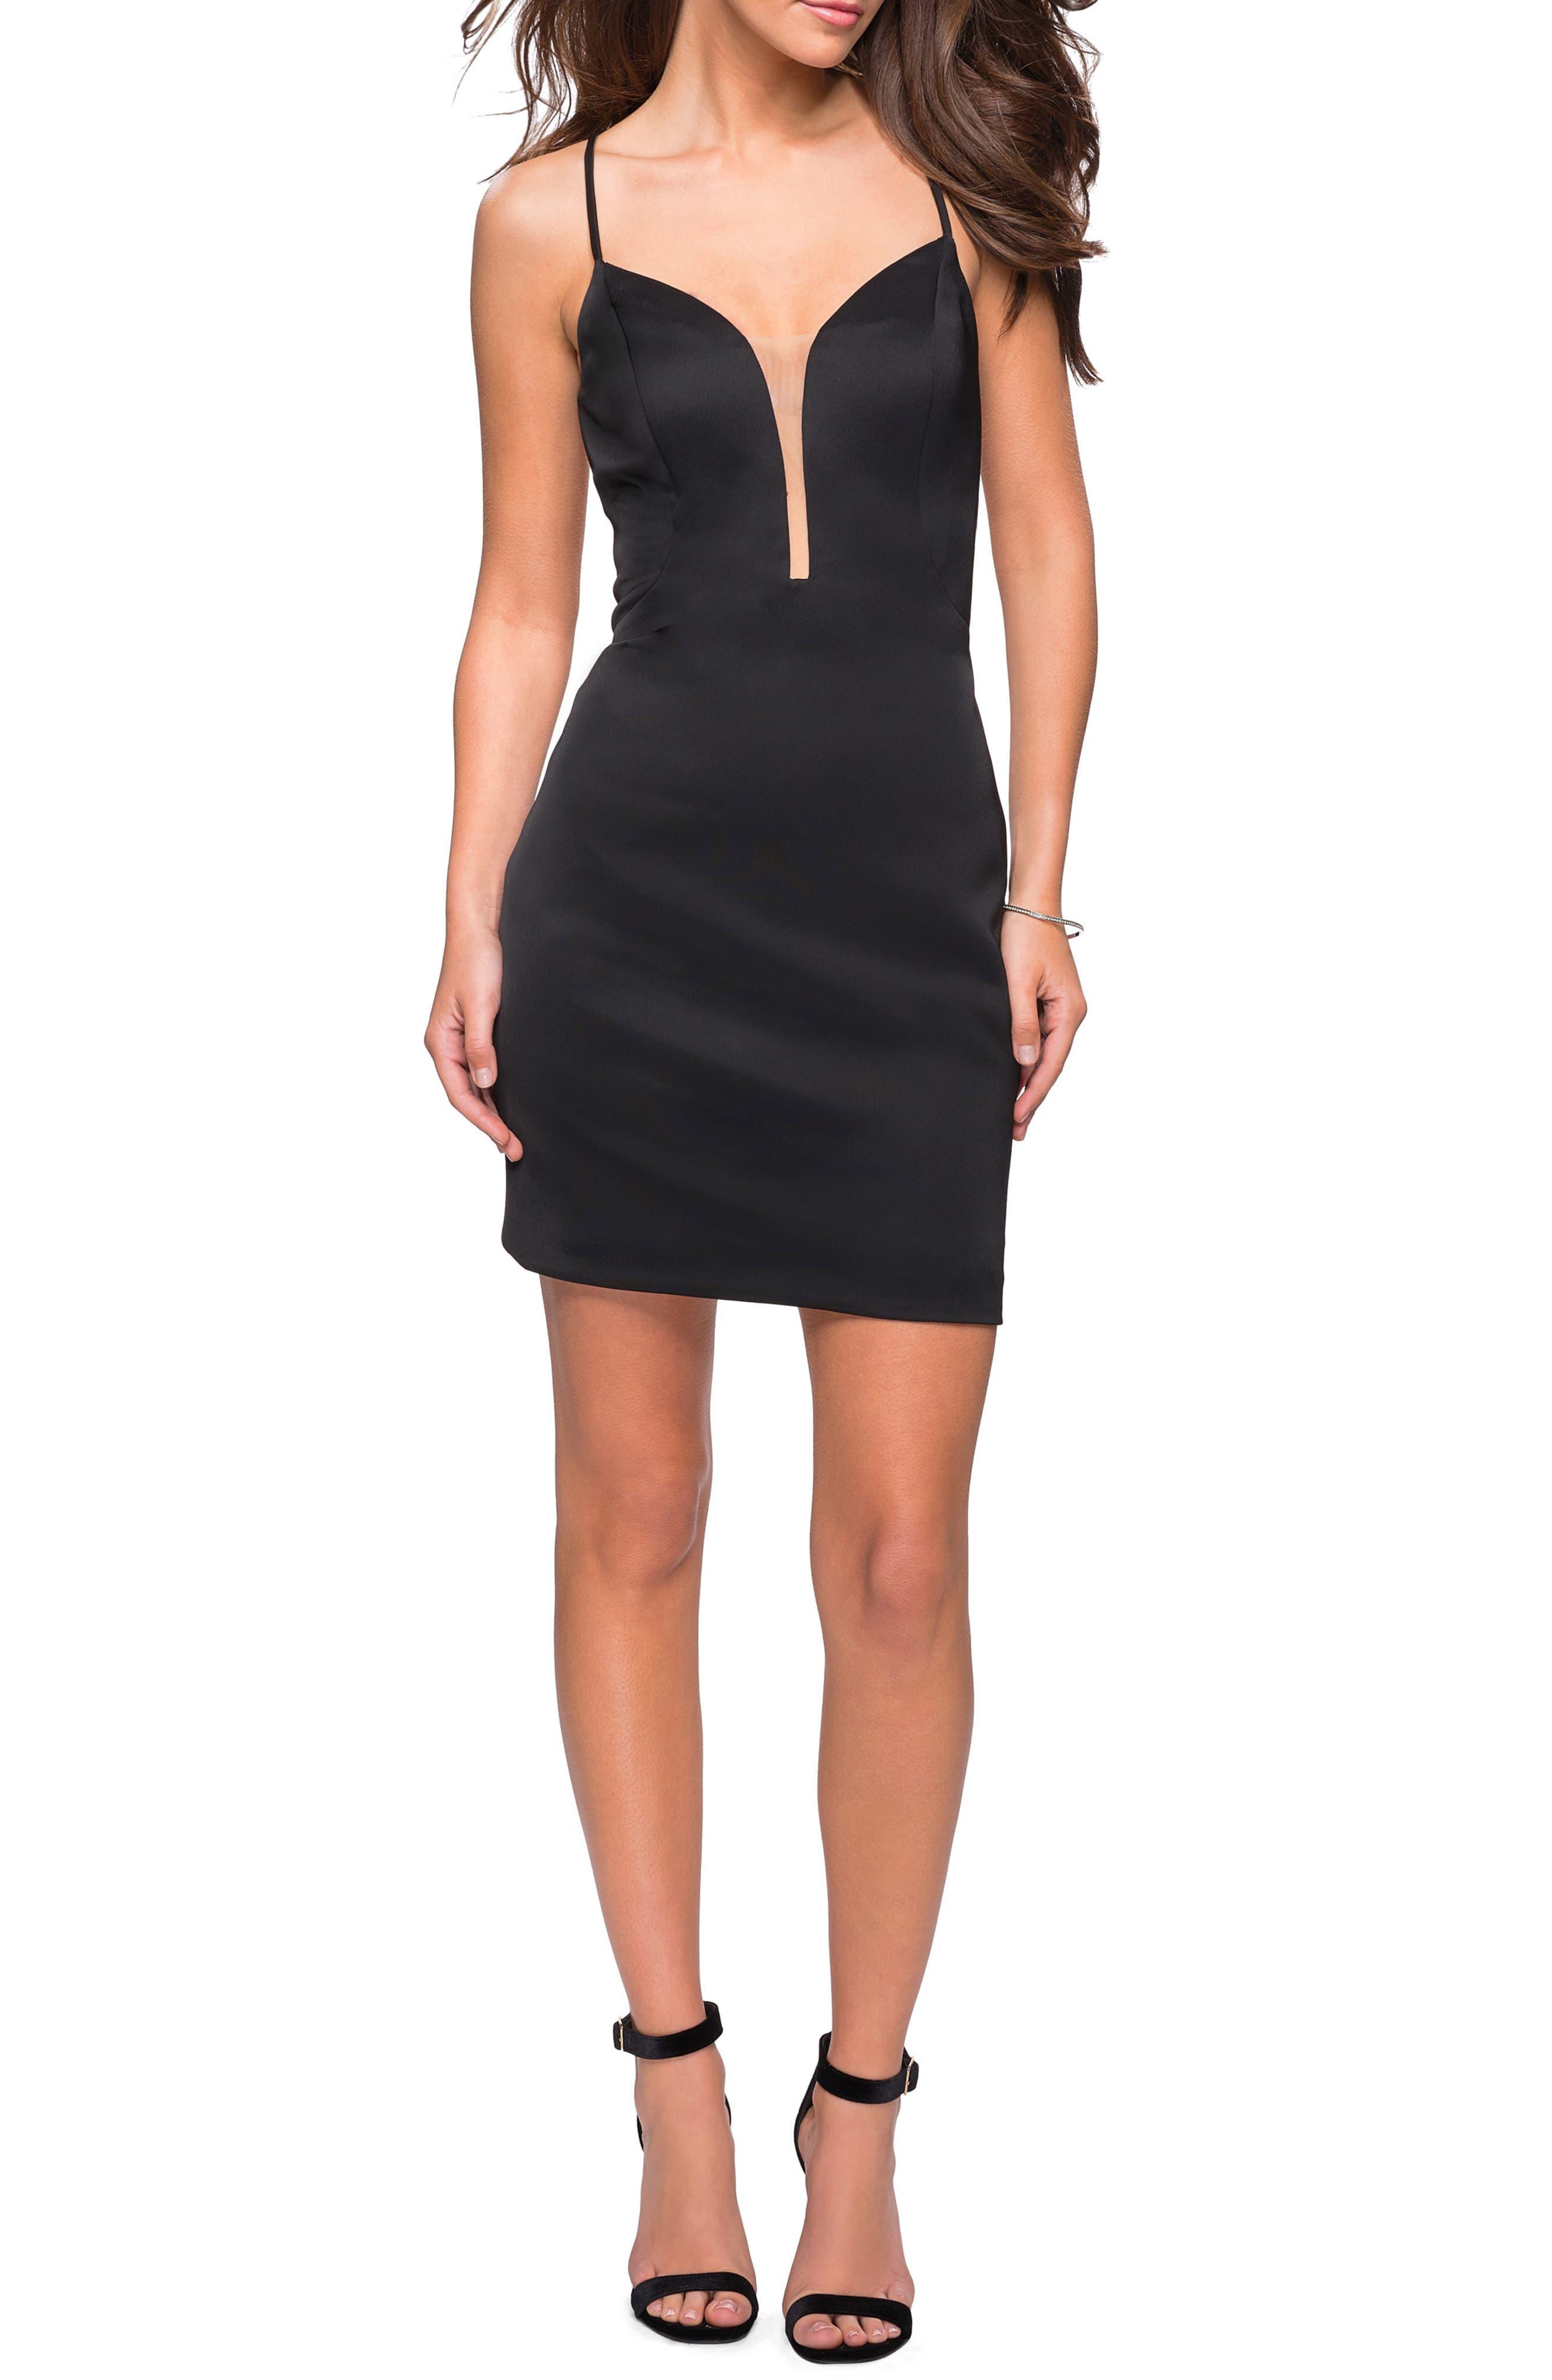 LA FEMME Strappy Back Satin Party Dress in Black